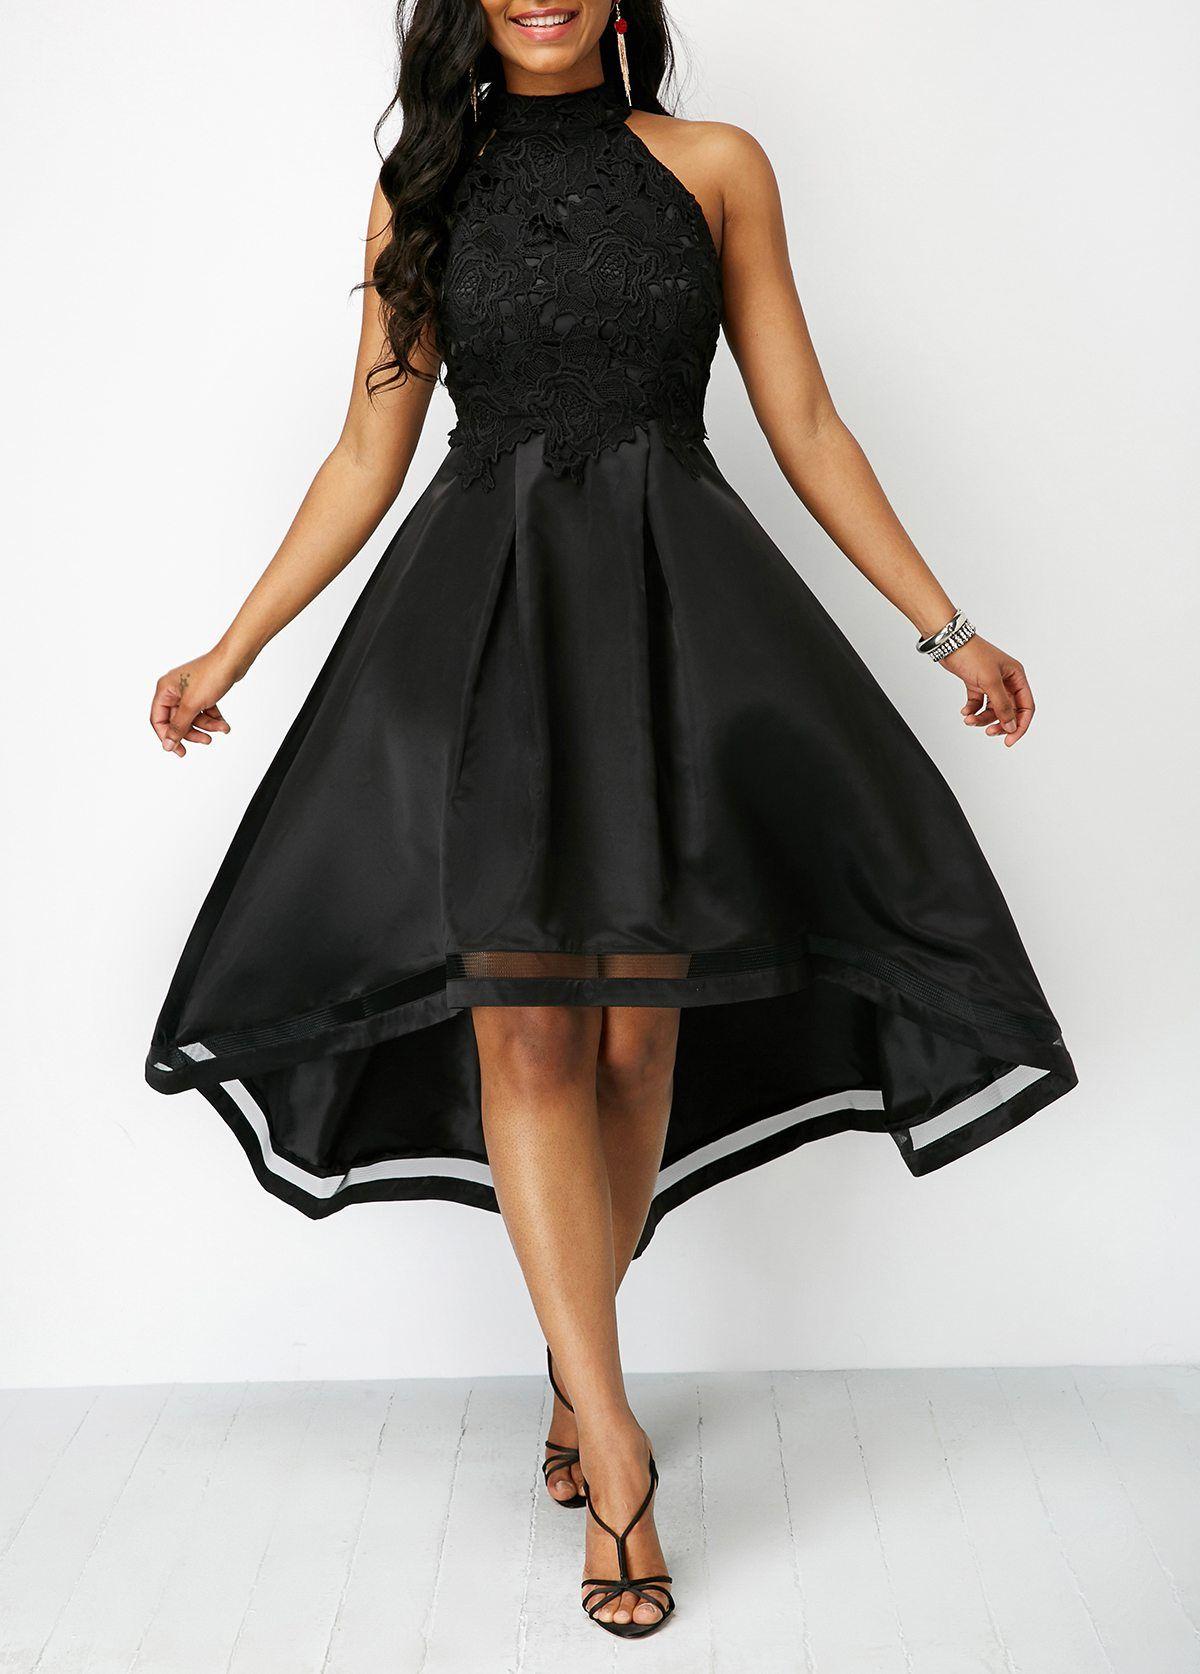 Lace Panel Sleeveless Black High Low Dress  138c70e64c